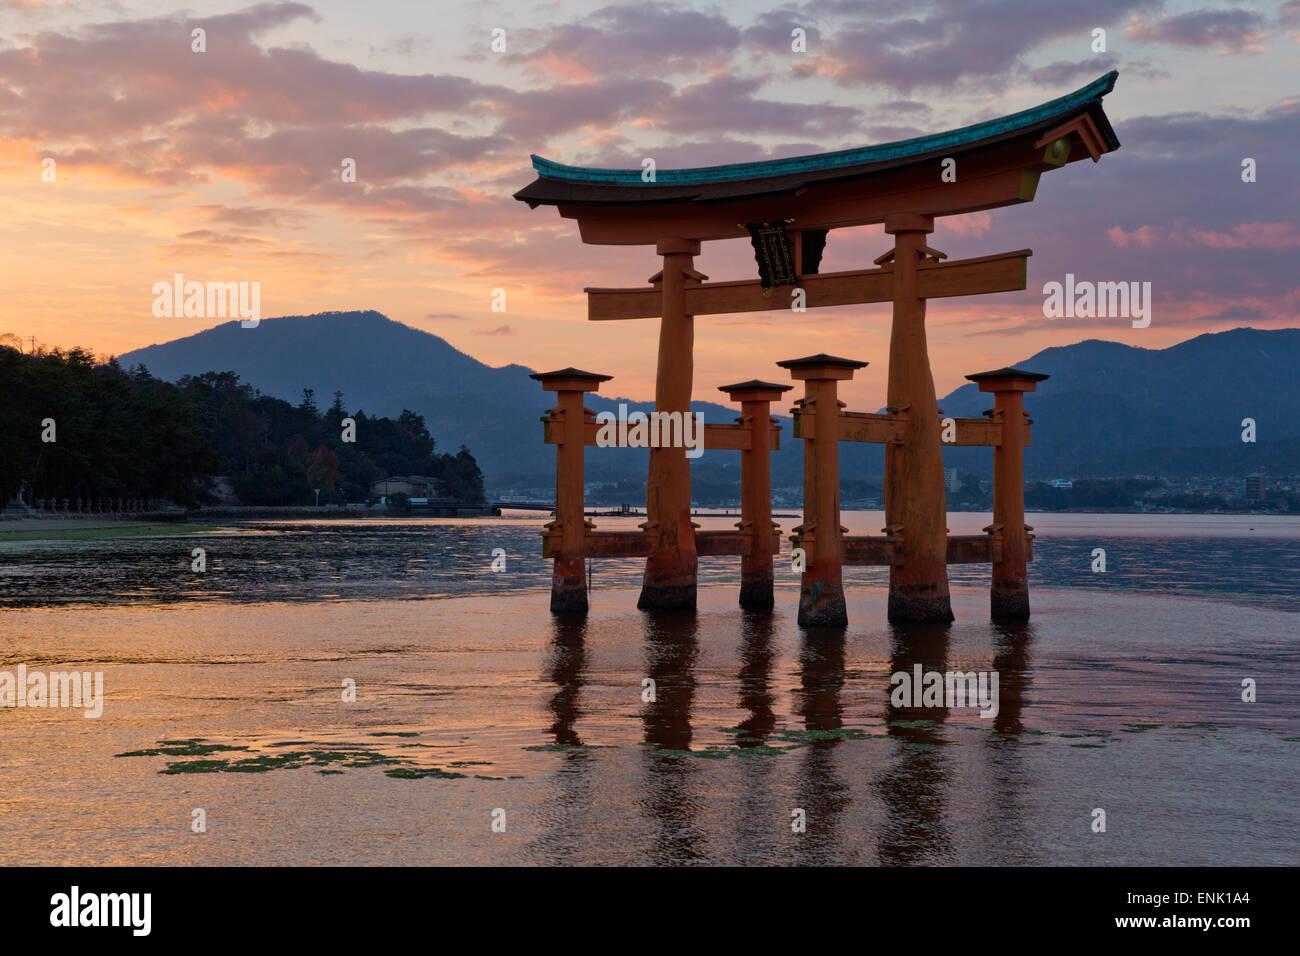 La puerta torii de Miyajima flotante del santuario Itsukushima al atardecer, la UNESCO, la Isla Miyajima, en el Imagen De Stock